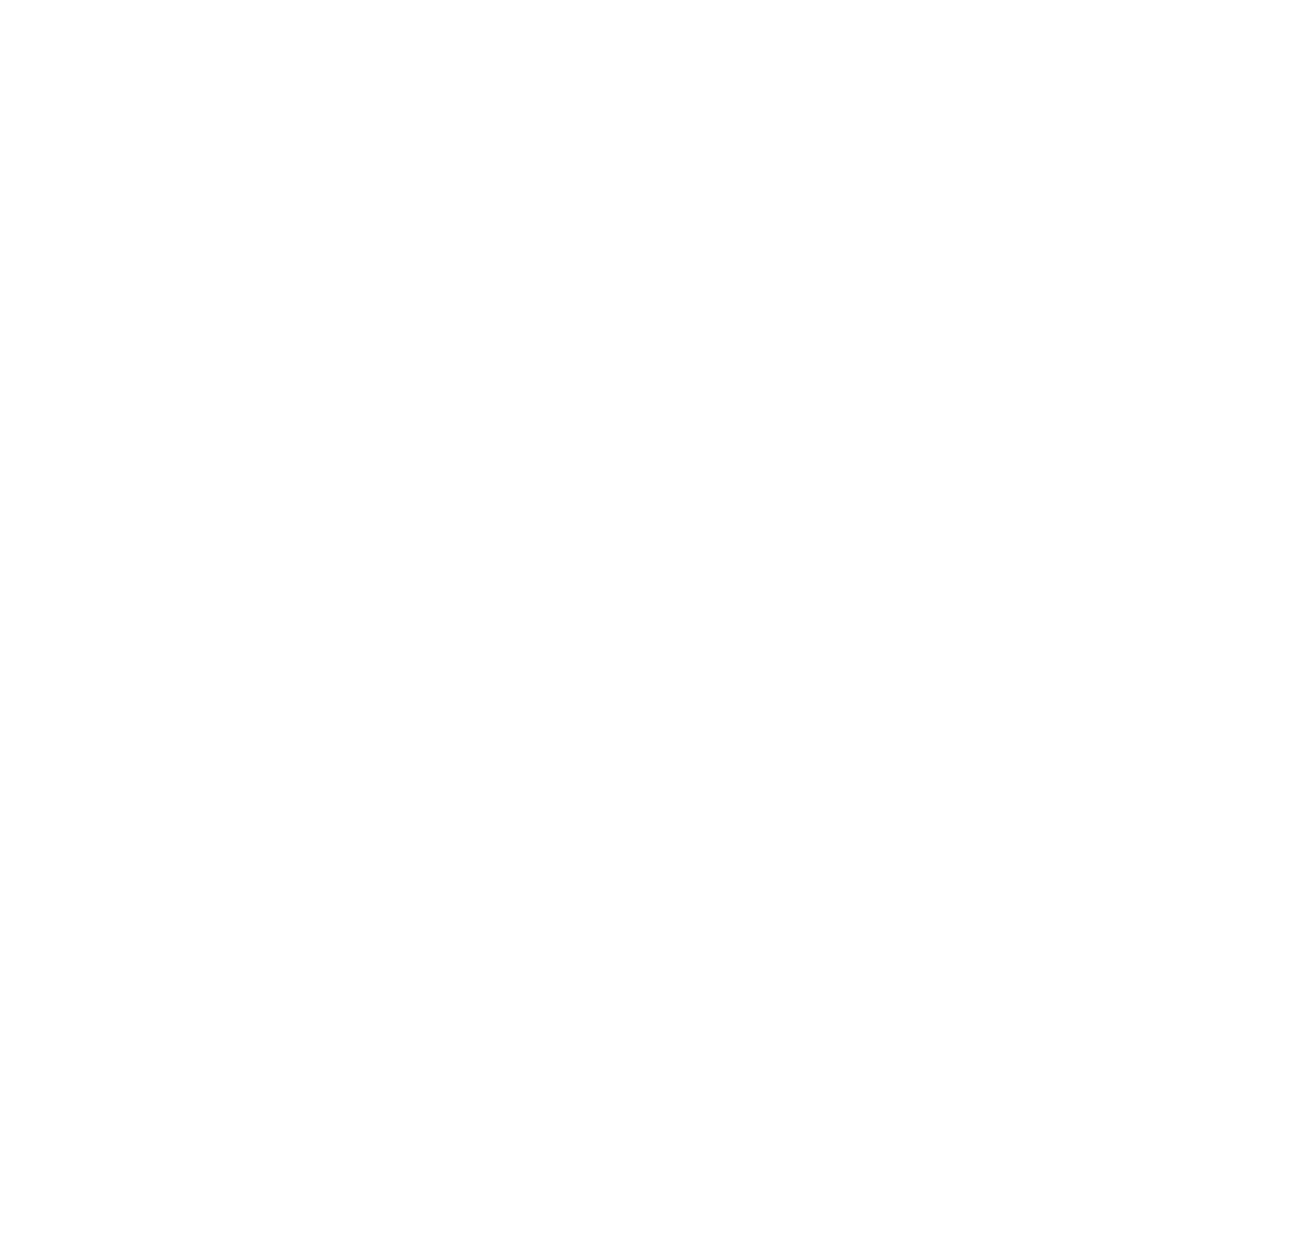 logo Lægårdens Camping i hvid